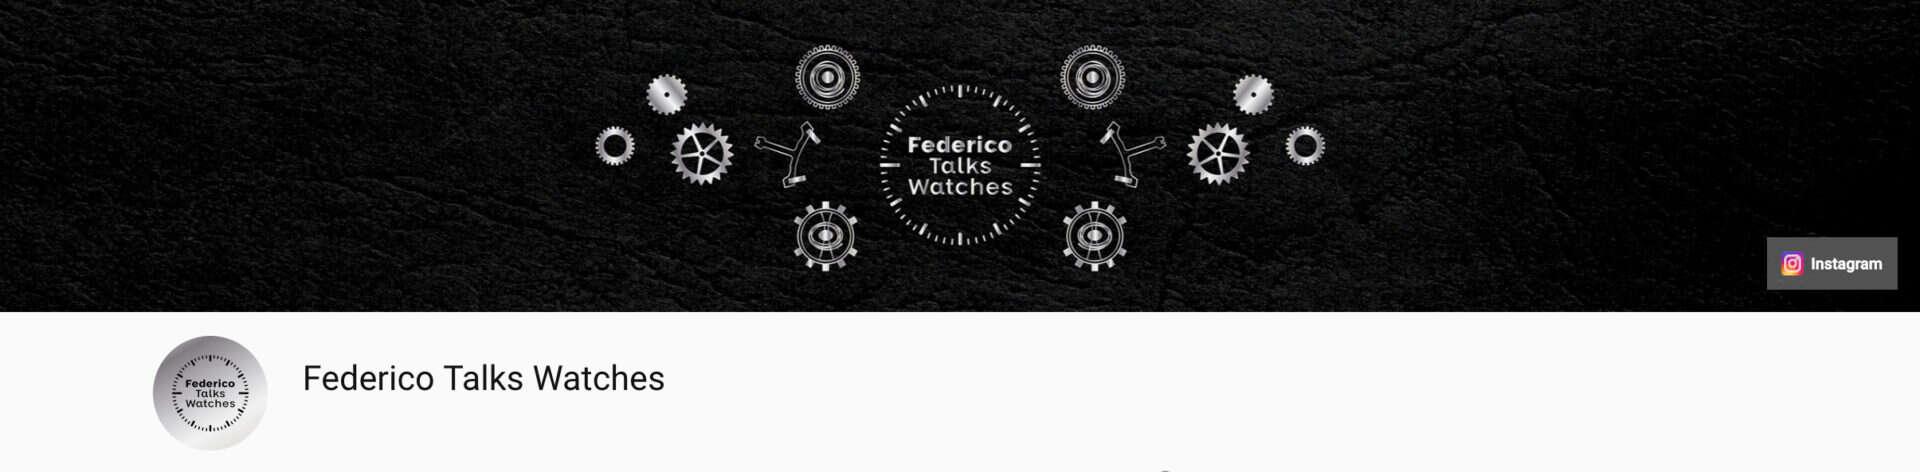 yt federico talks watches